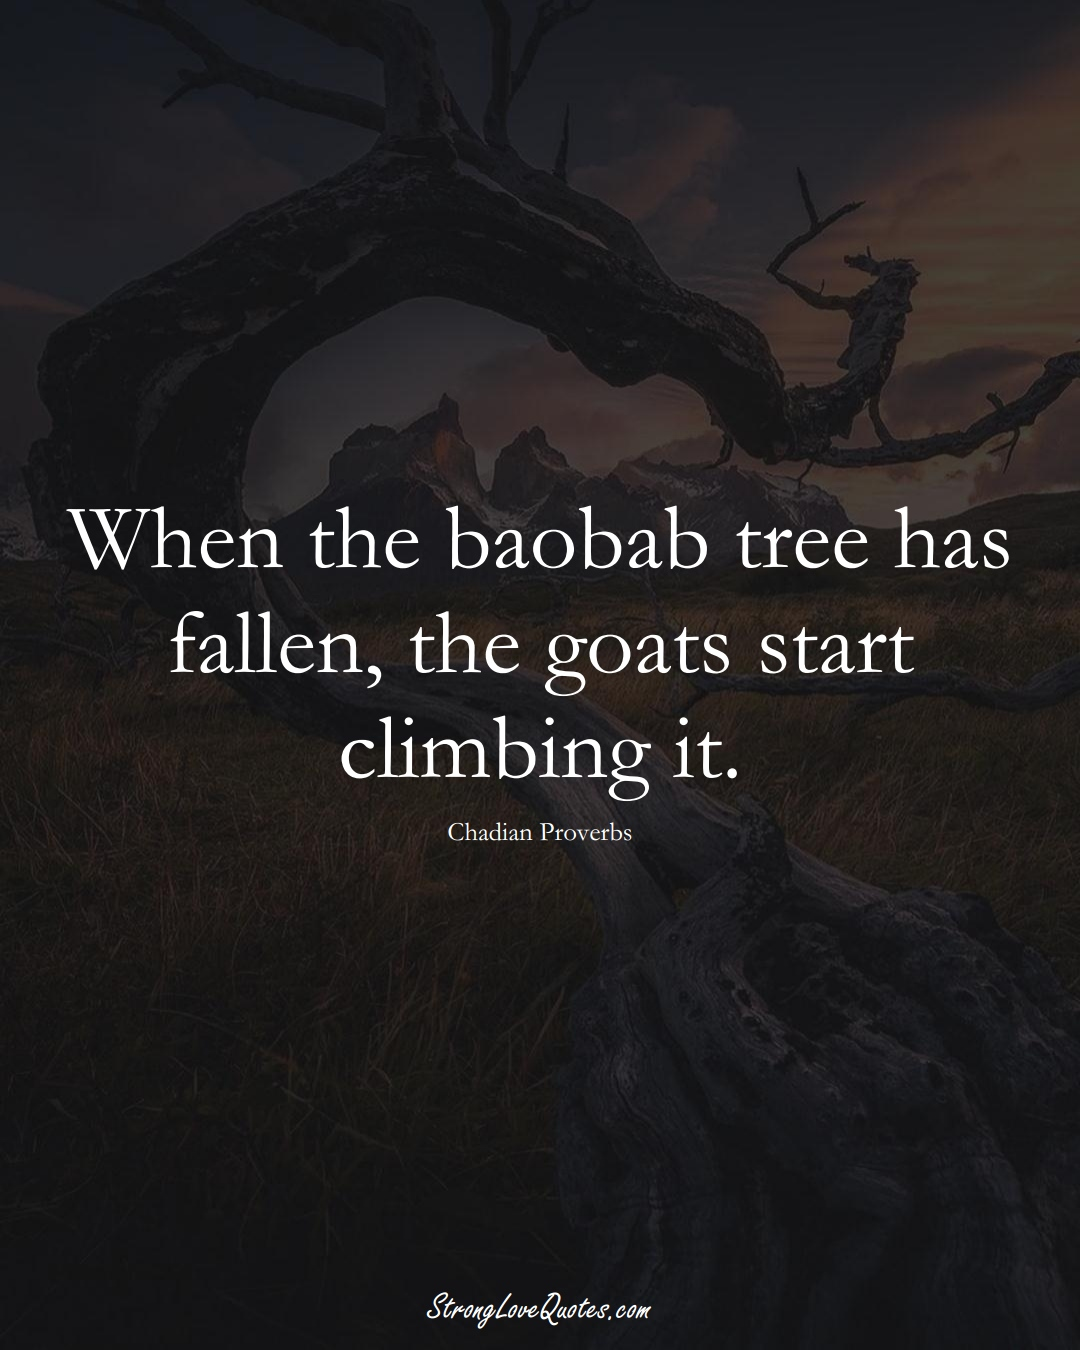 When the baobab tree has fallen, the goats start climbing it. (Chadian Sayings);  #AfricanSayings